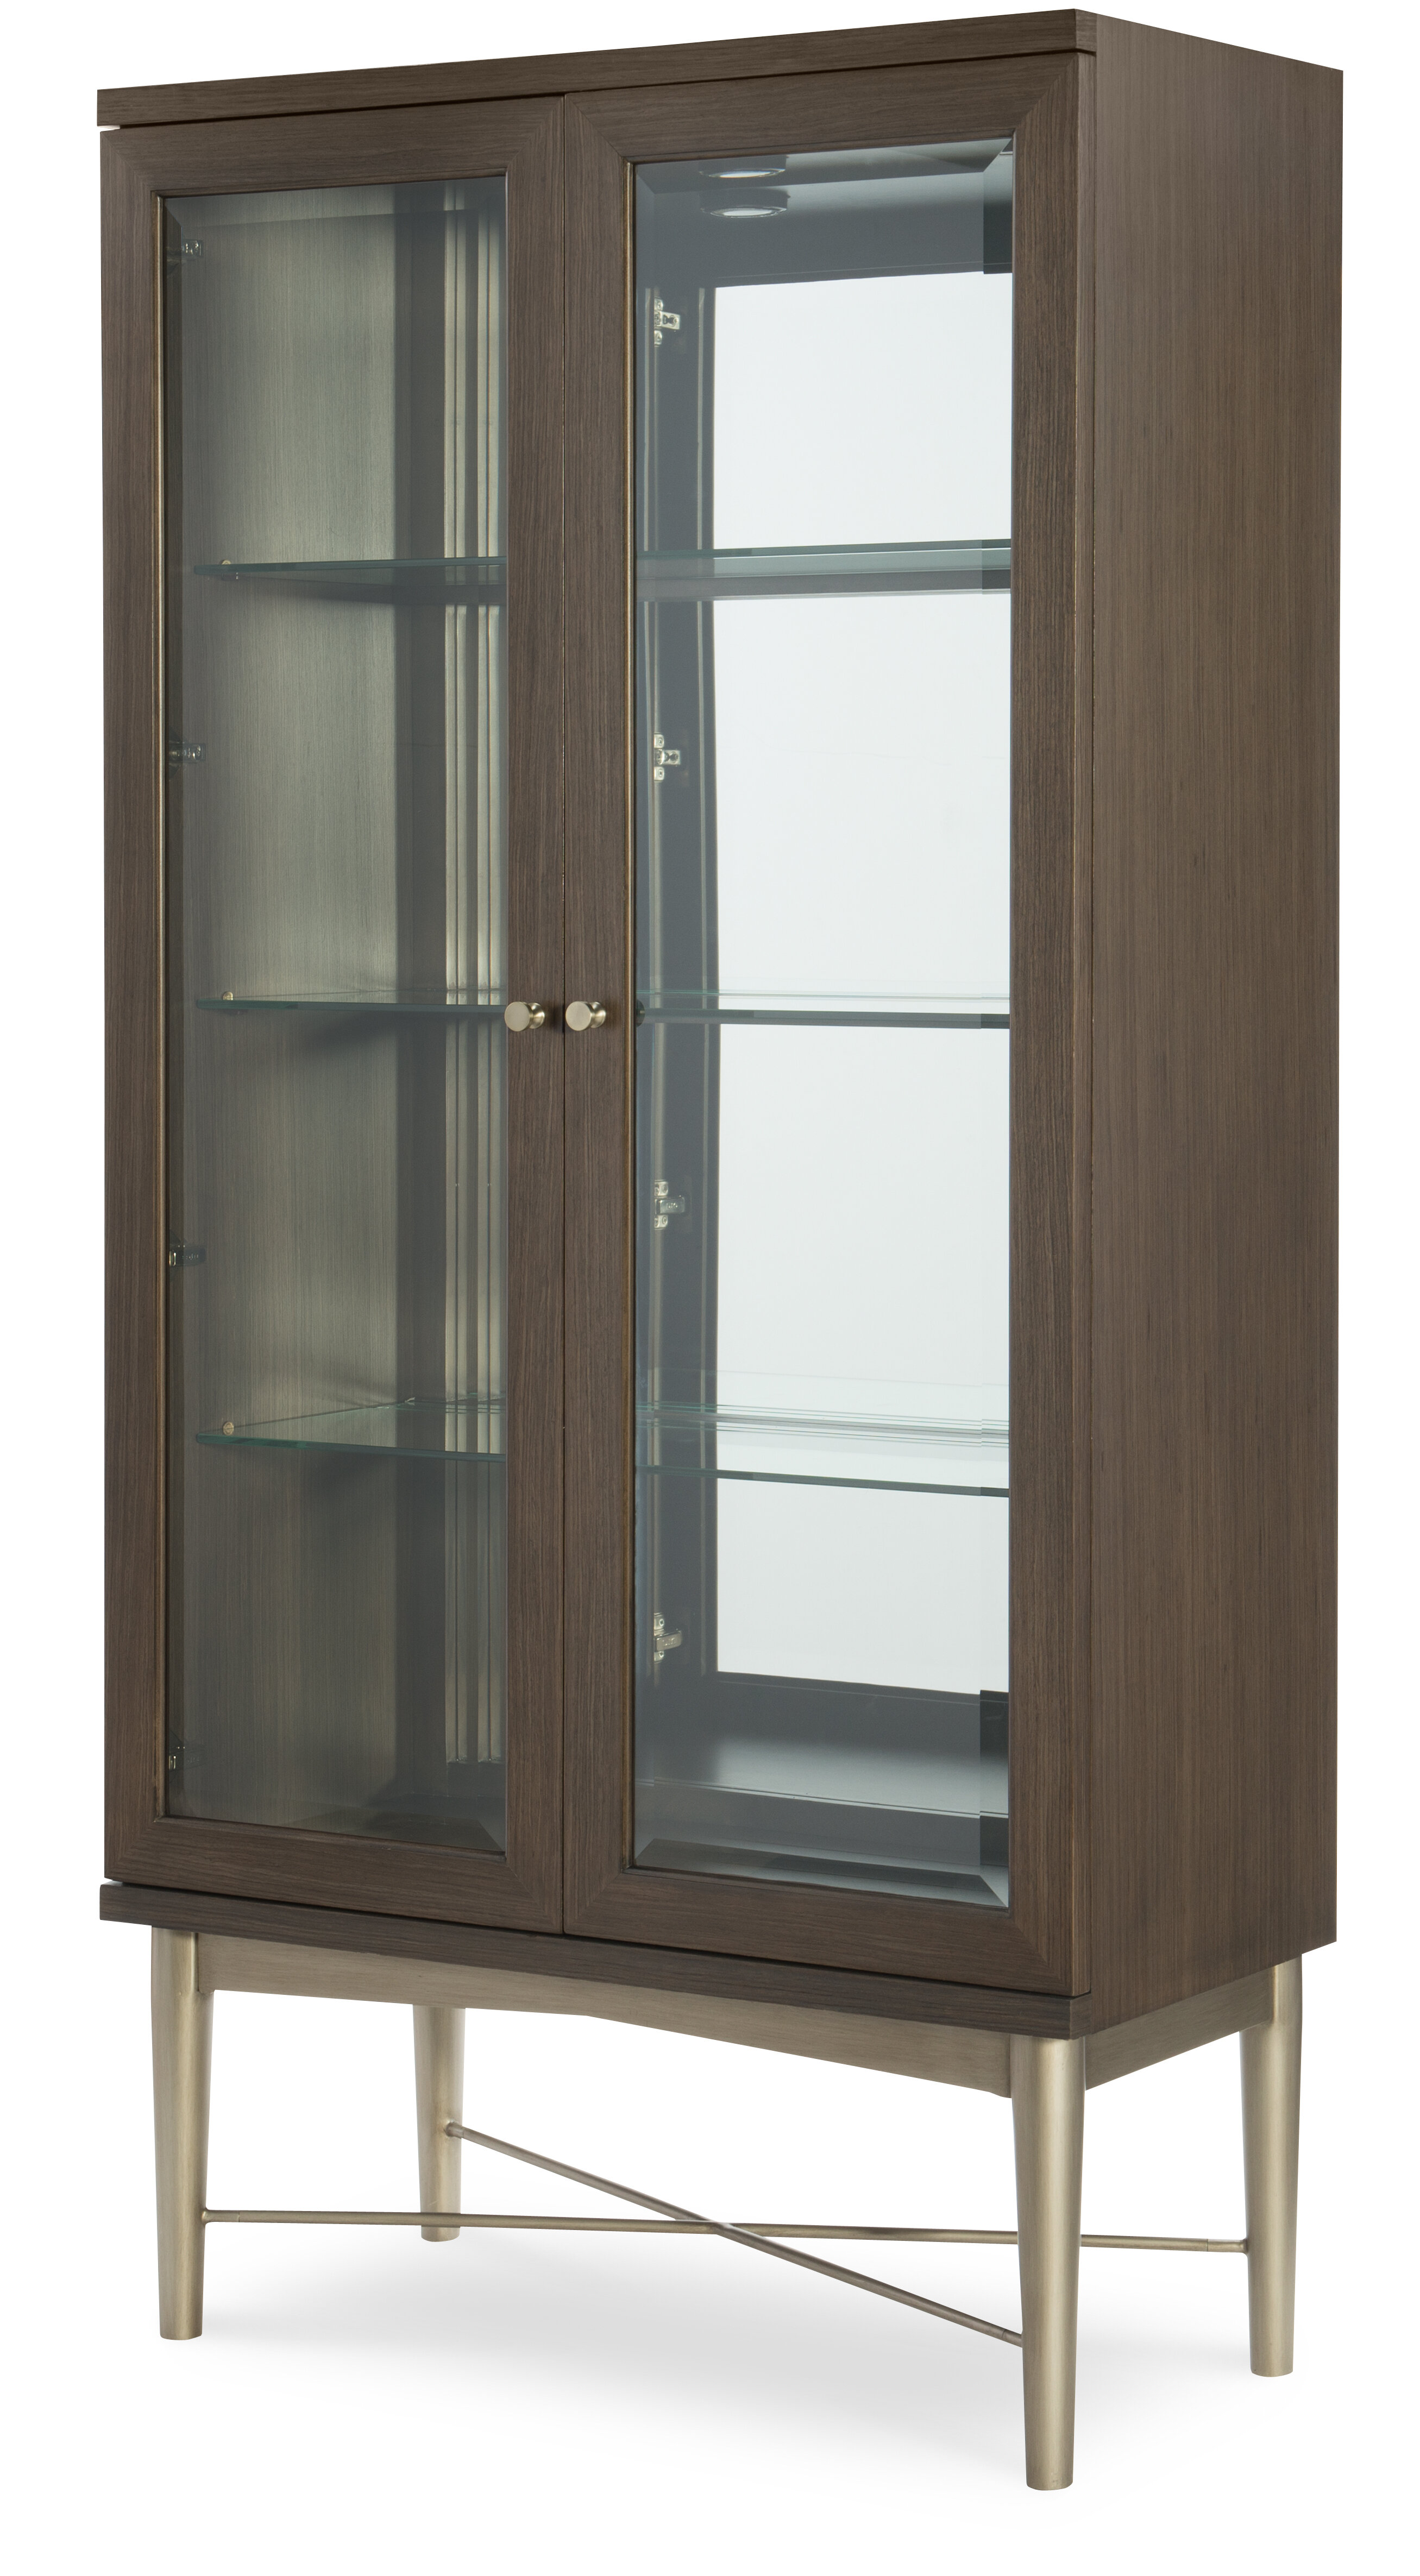 Rachael Ray Home Soho By Rachael Ray Home Lighted Curio Cabinet | Wayfair